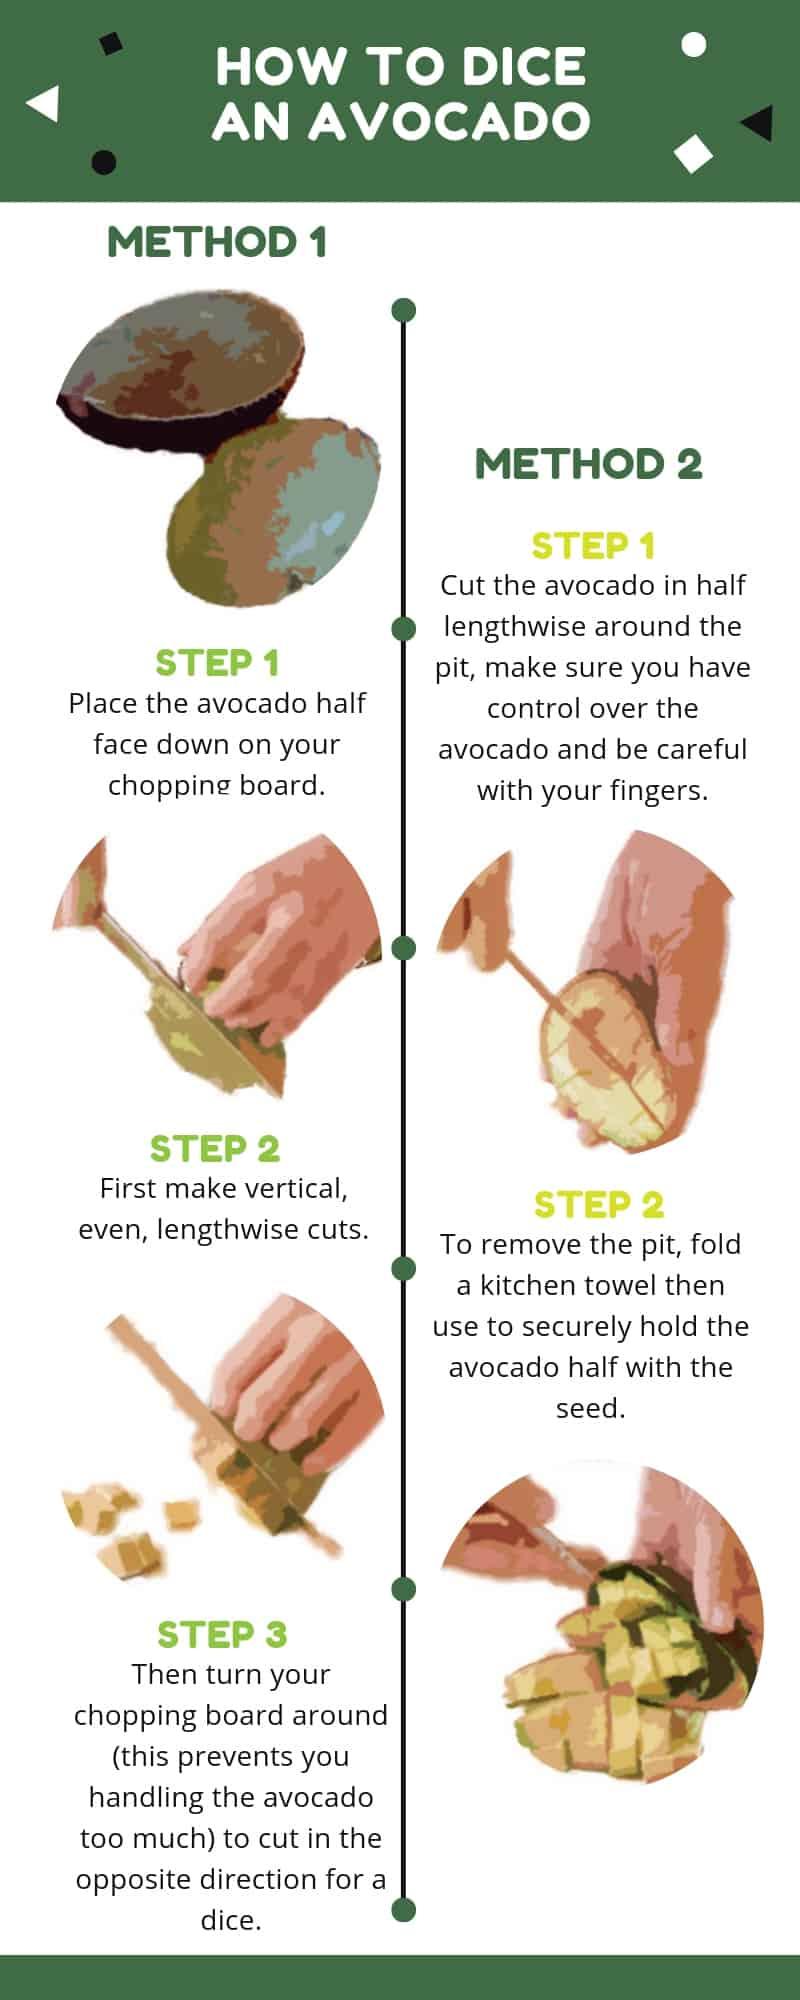 HOW TO DICE AN AVOCADO-2